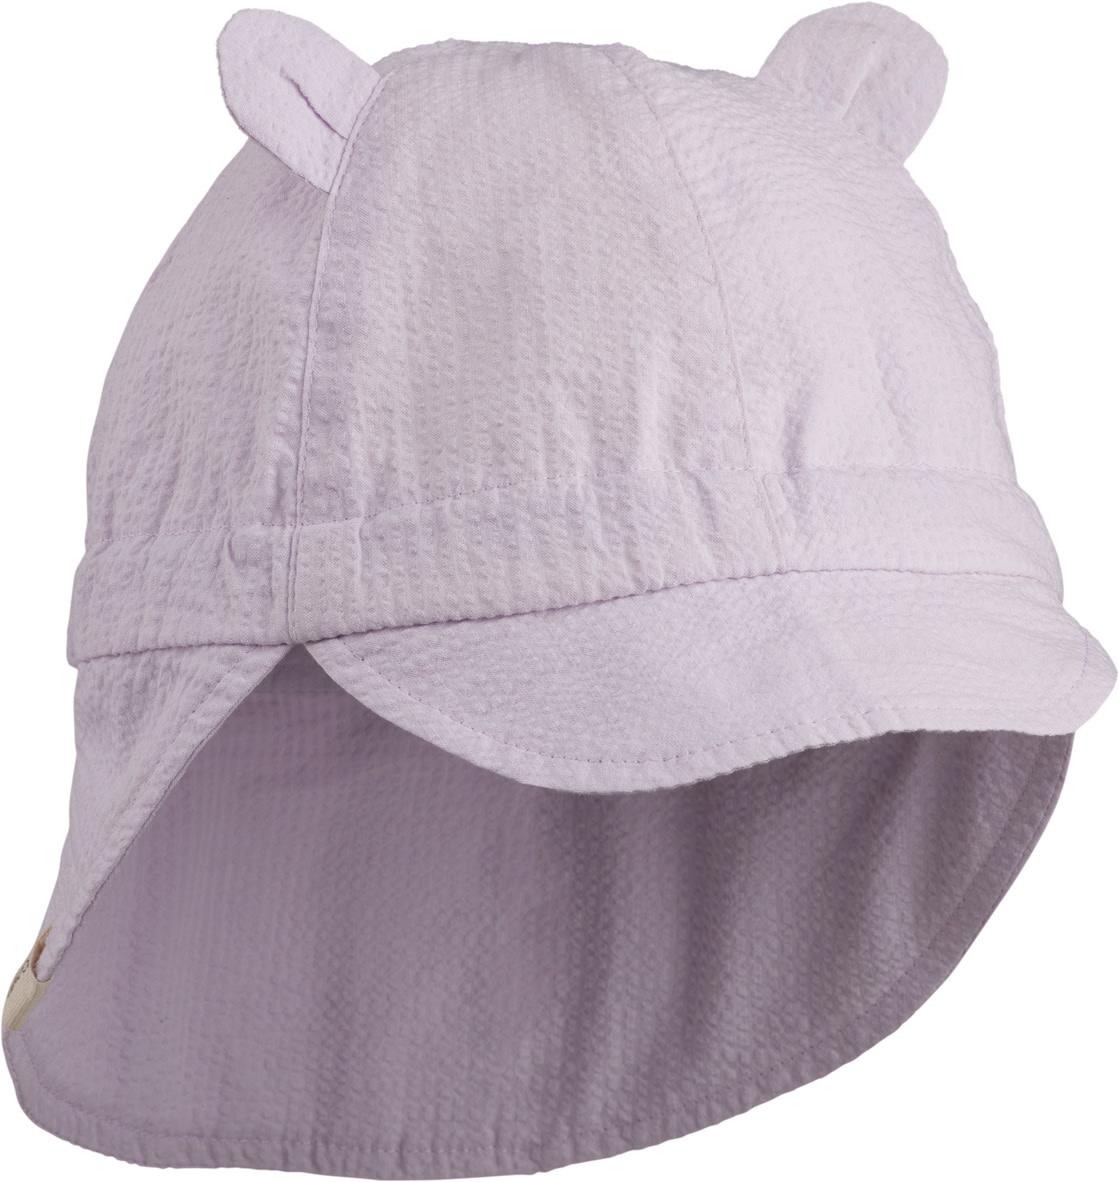 Levi sun hat light lavender-1